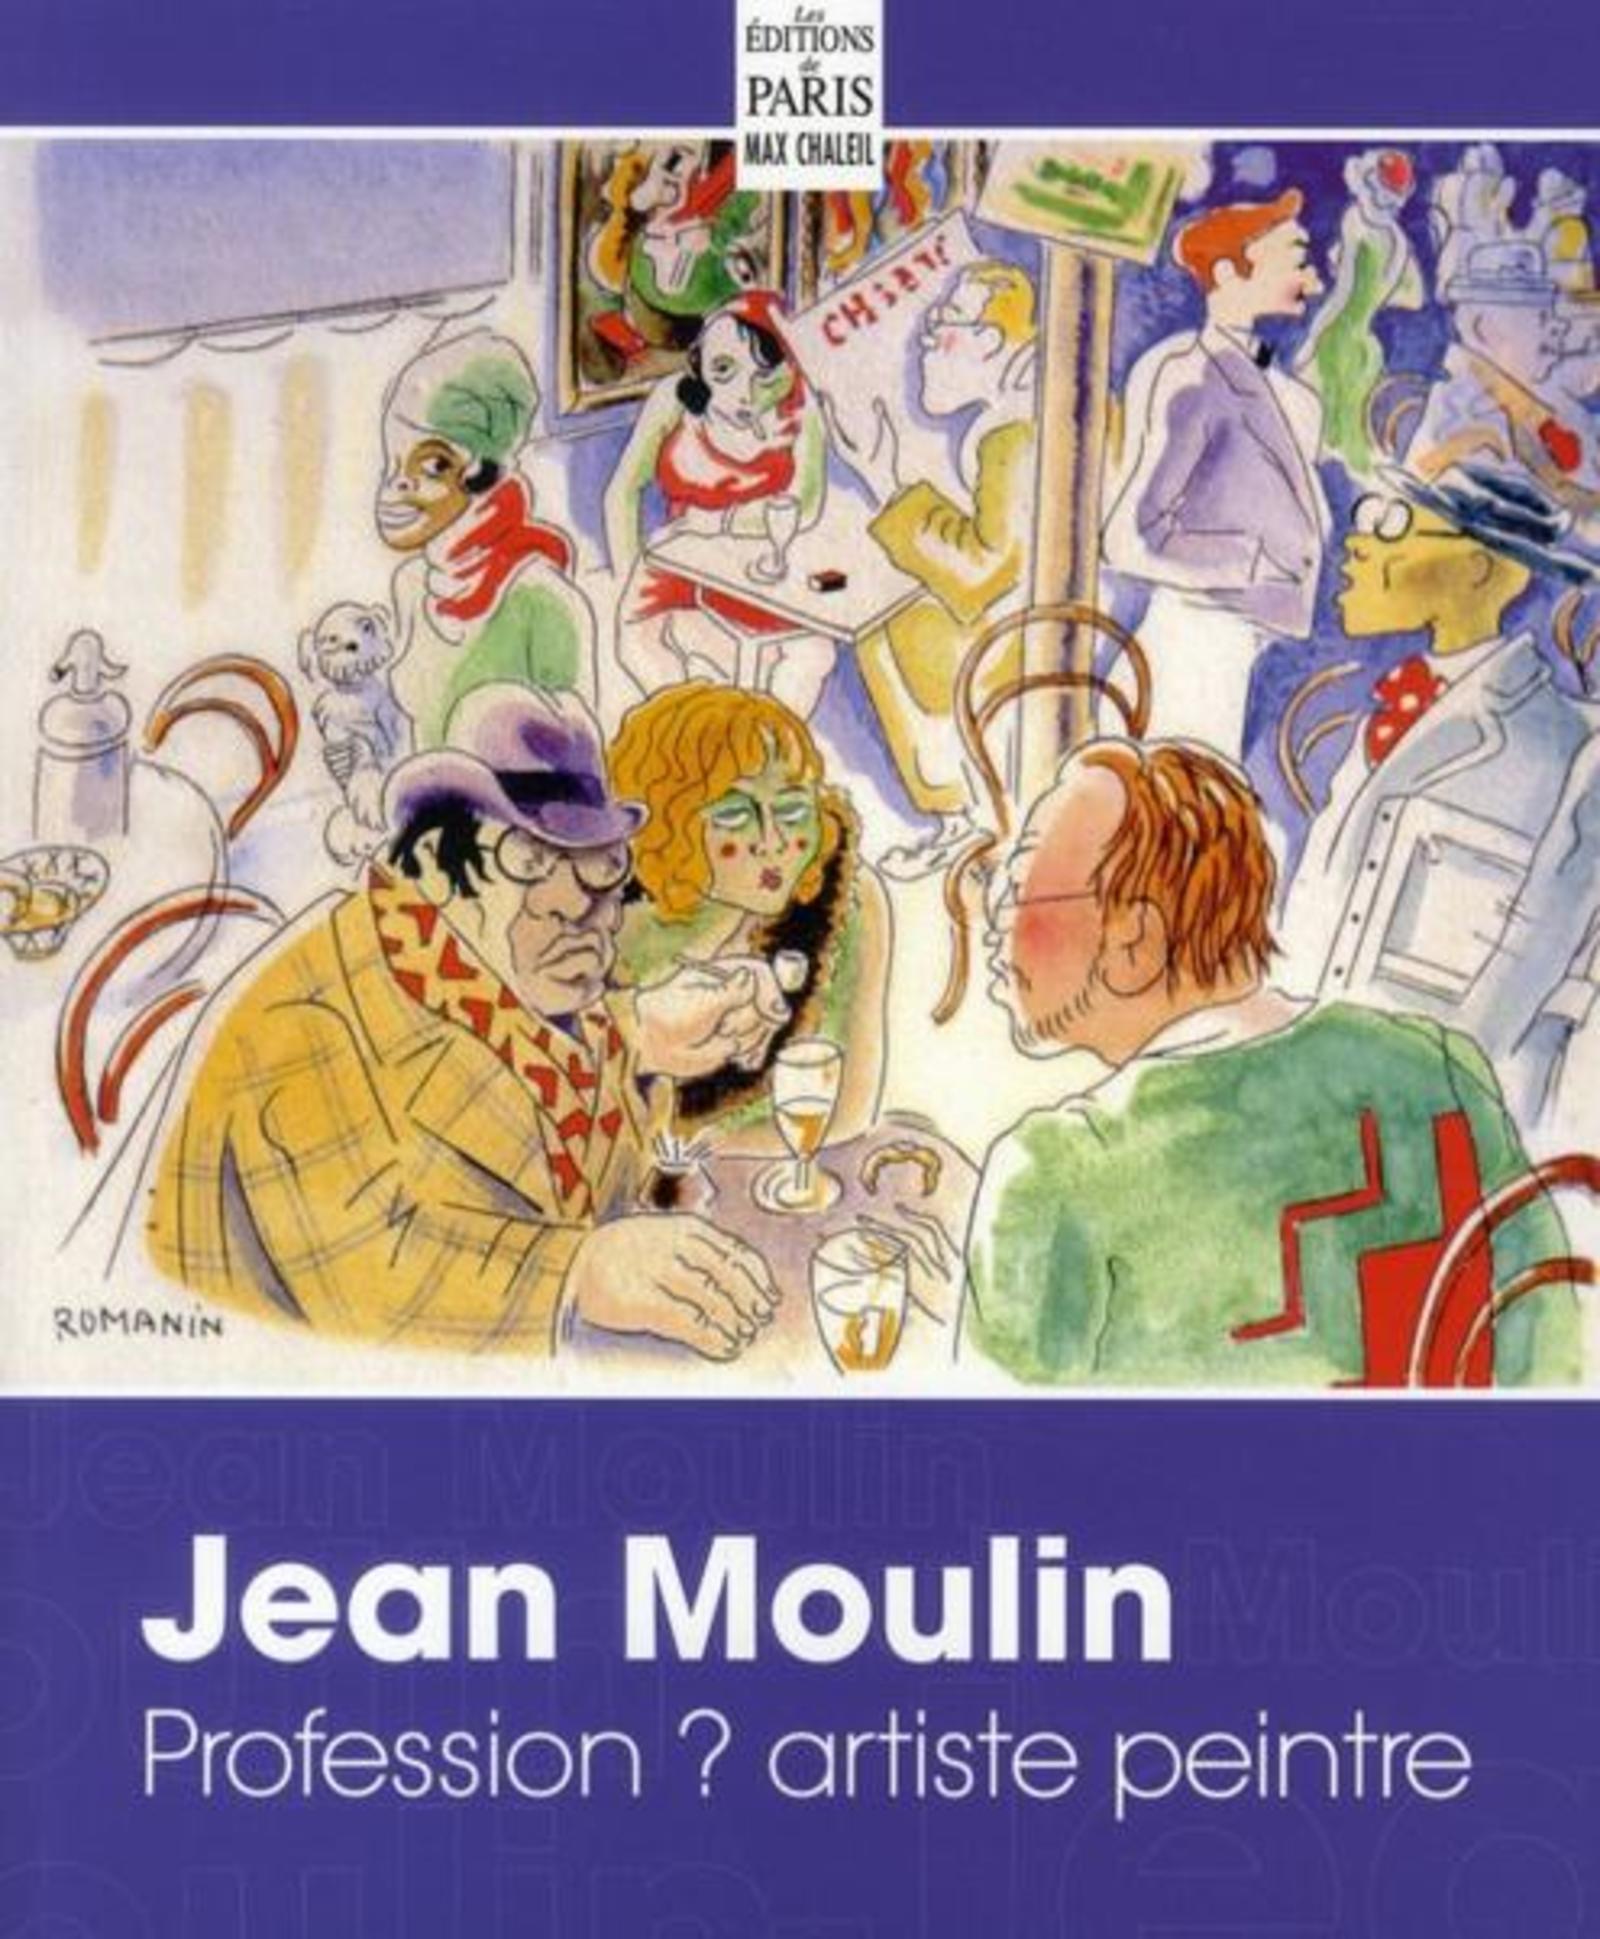 JEAN MOULIN, PROFESSION? ARTISTE PEINTRE